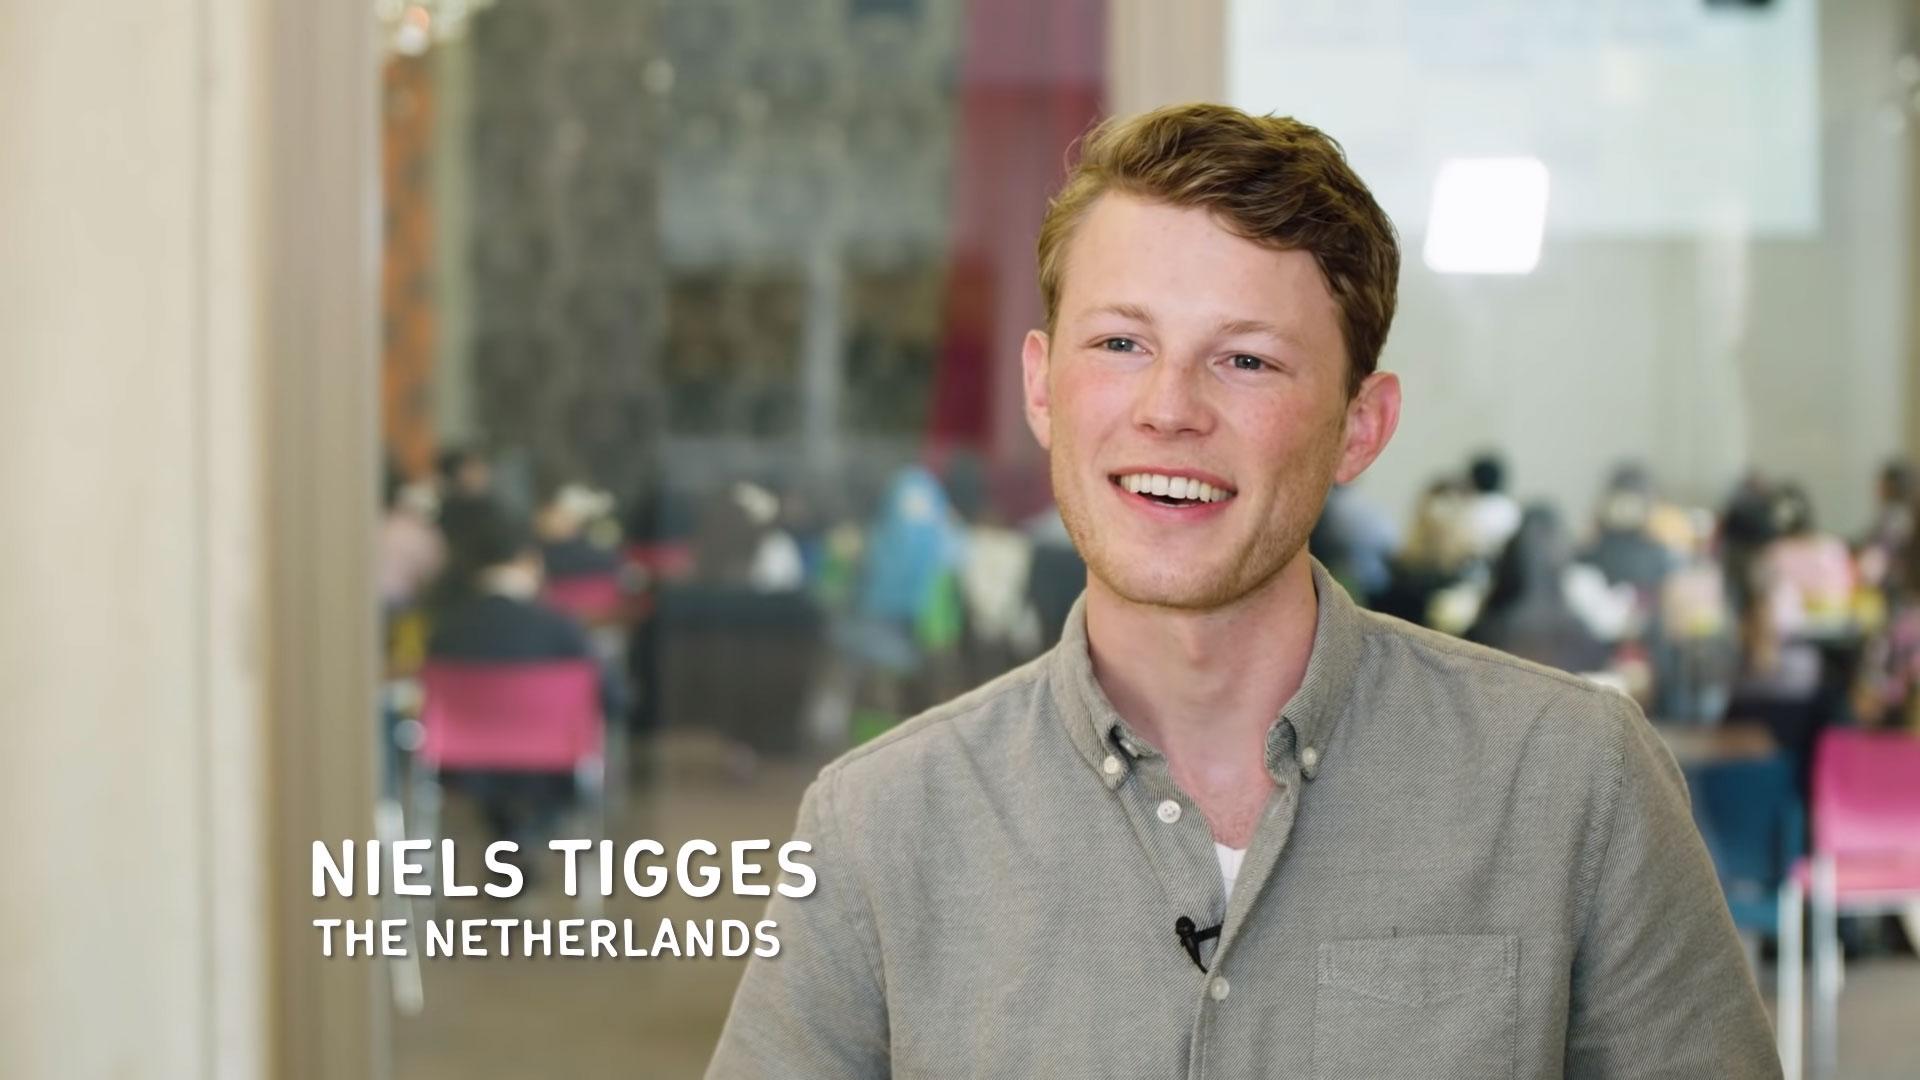 Niels splash image